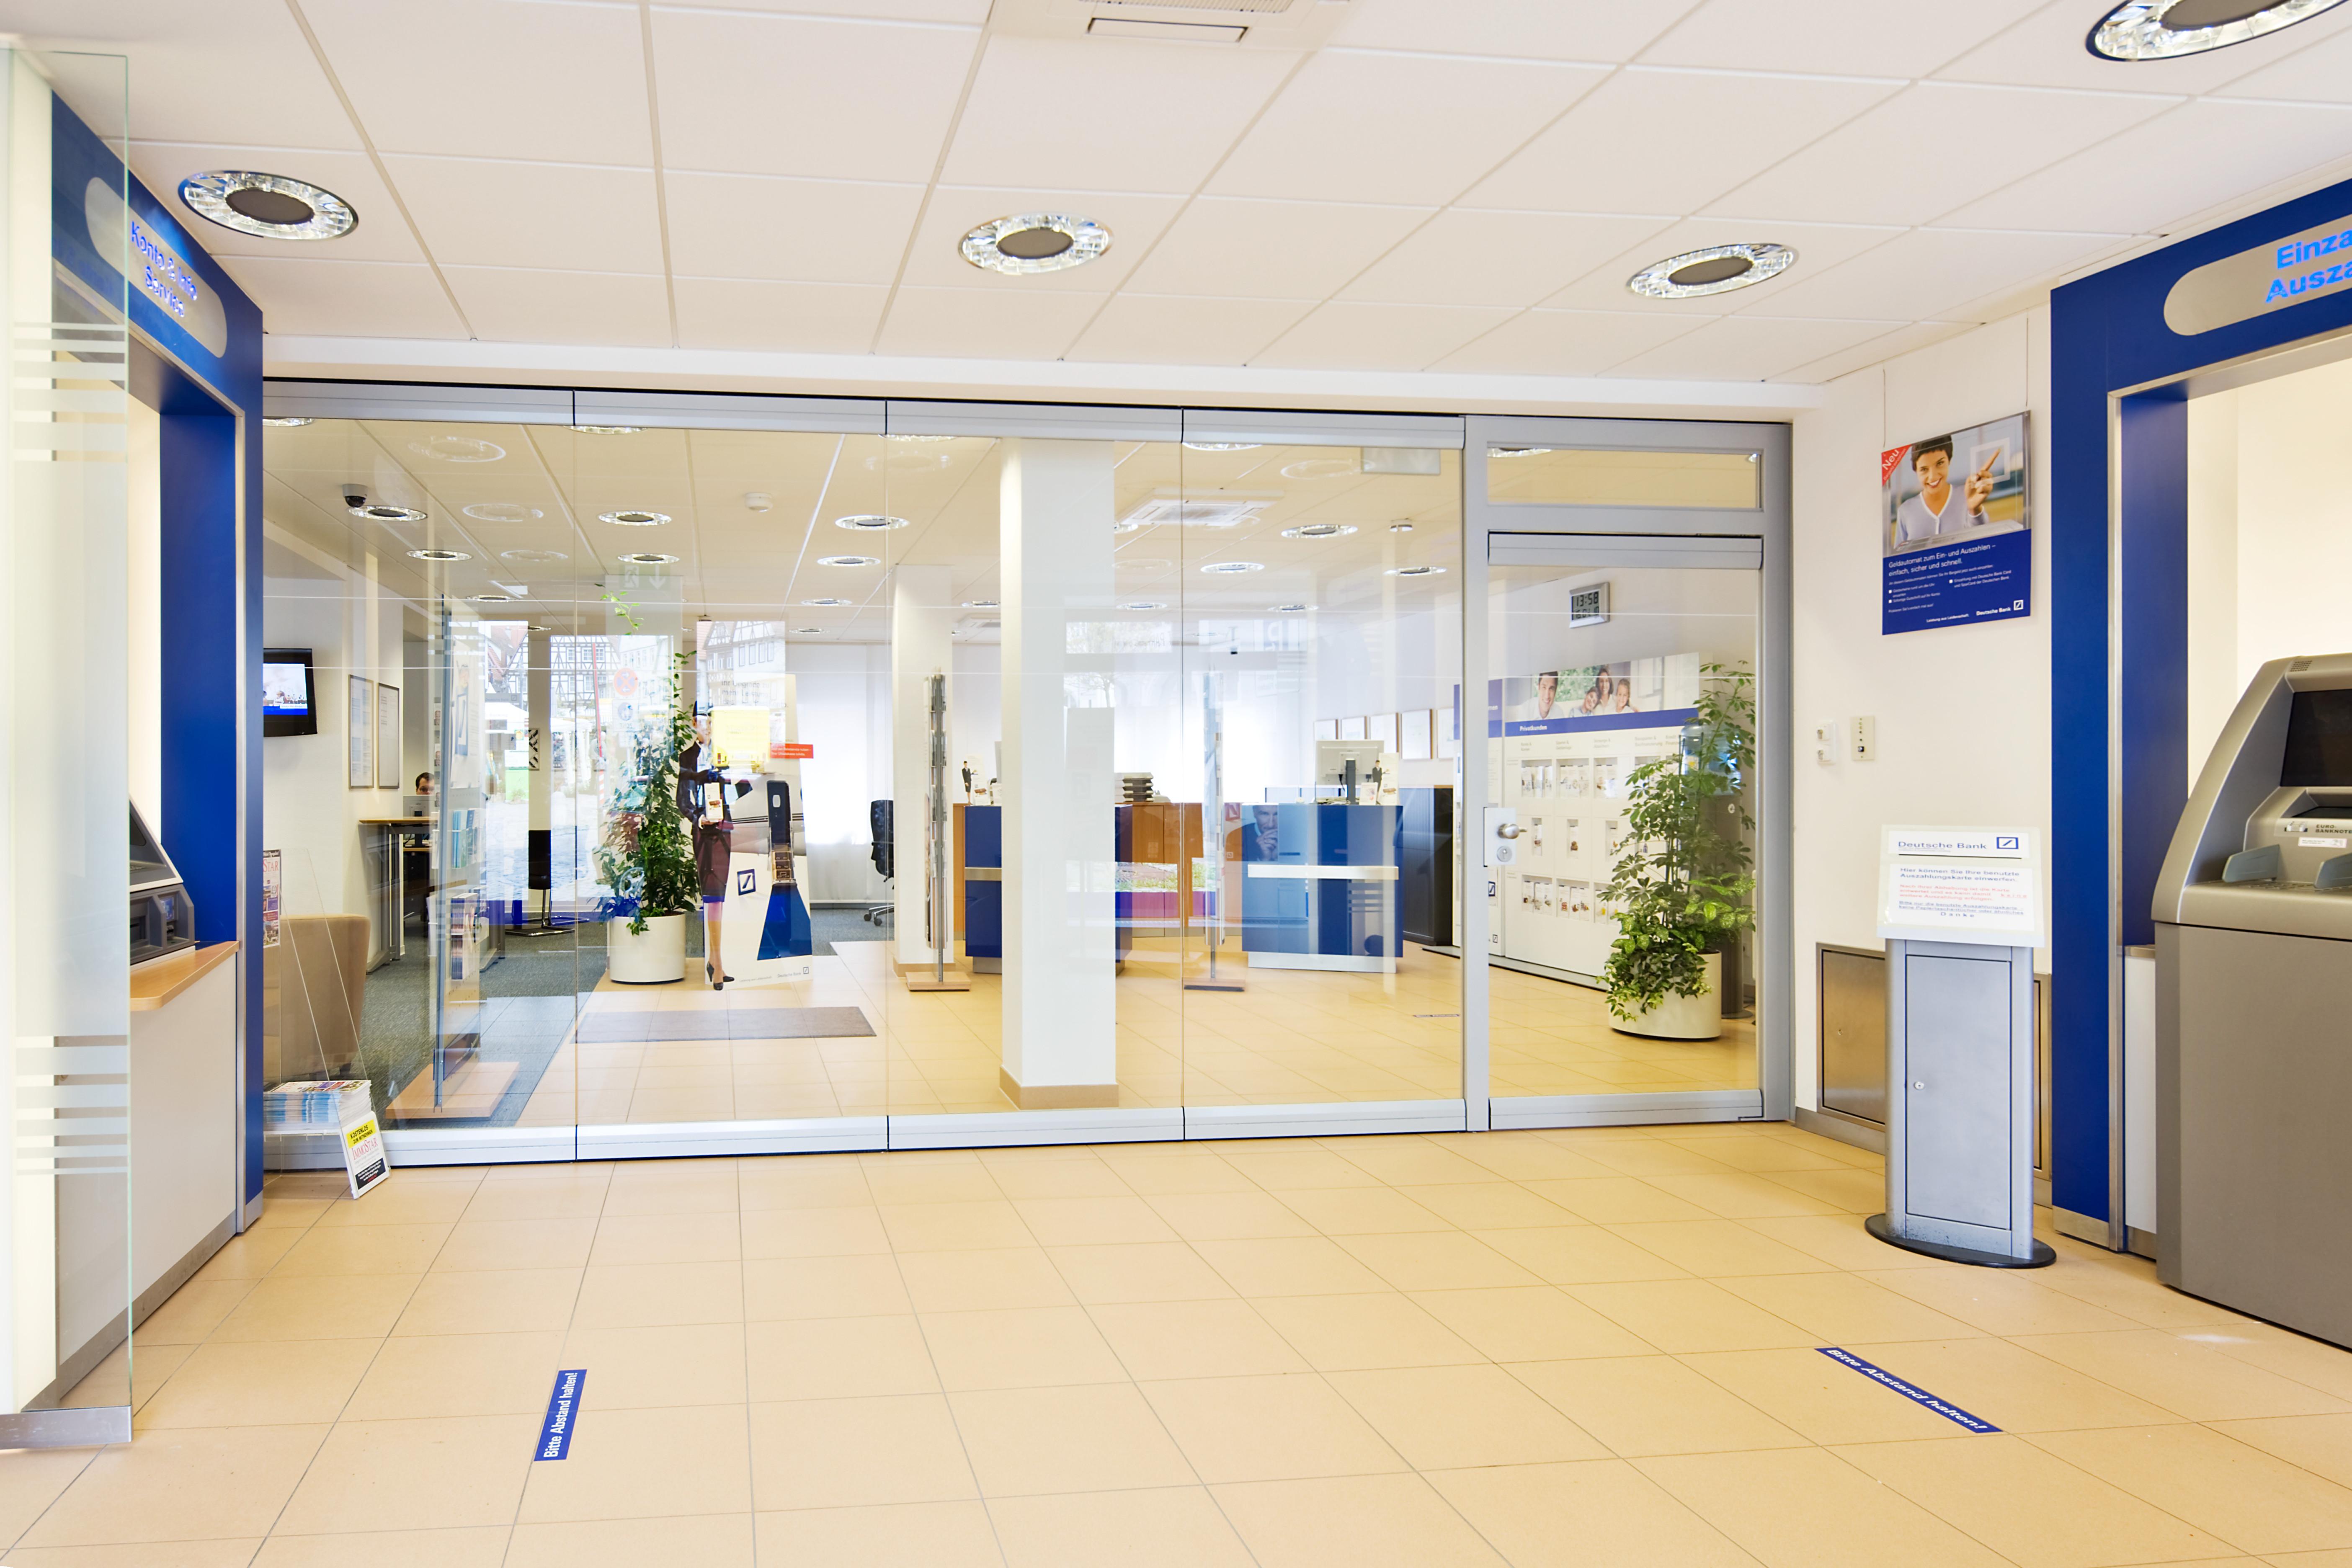 MSW Schiebebedarfselement, Deutsche Bank Leonberg